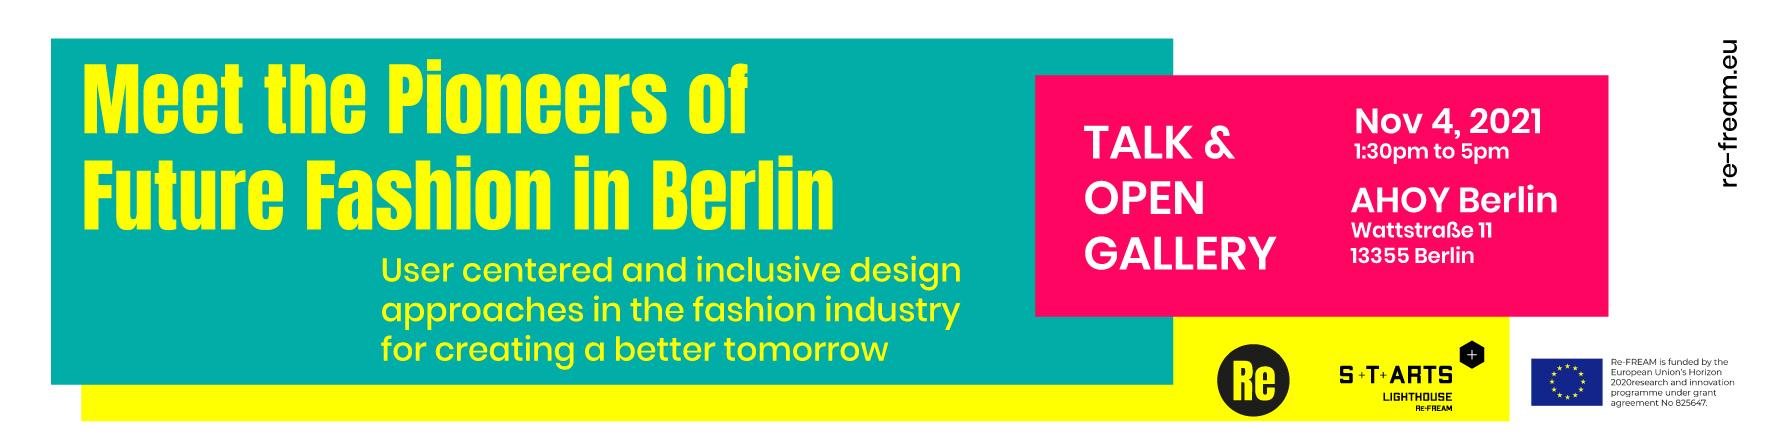 Meet the Pioneers of Future Fashion in Berlin